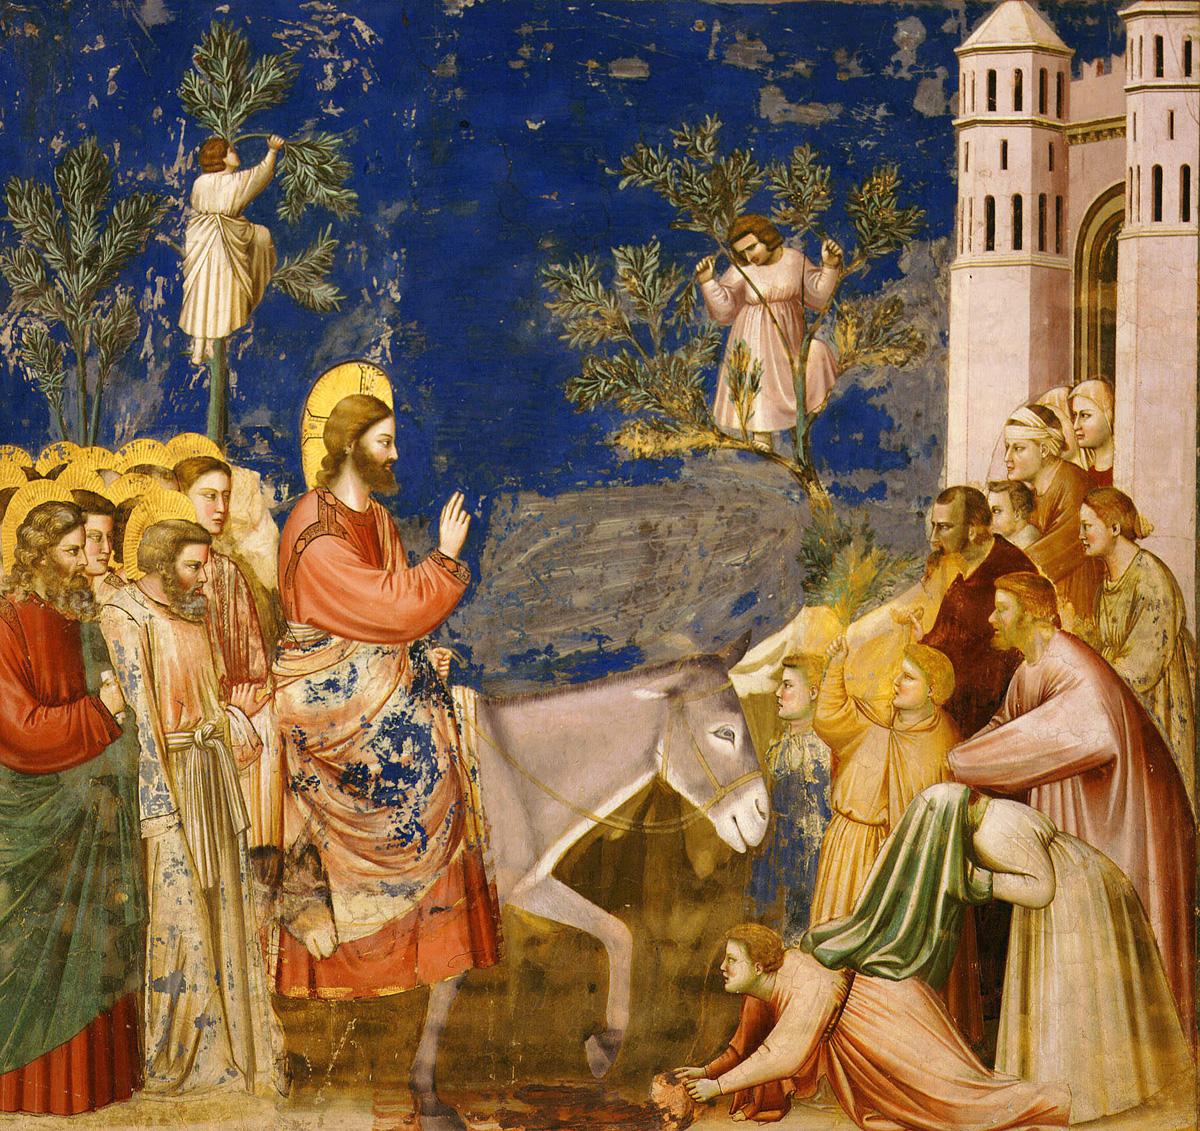 Jesus entering Jerusalem, Scrovegni Chapel (detail), Padua, Italy, by Giotto di Bondone, c. 1307.